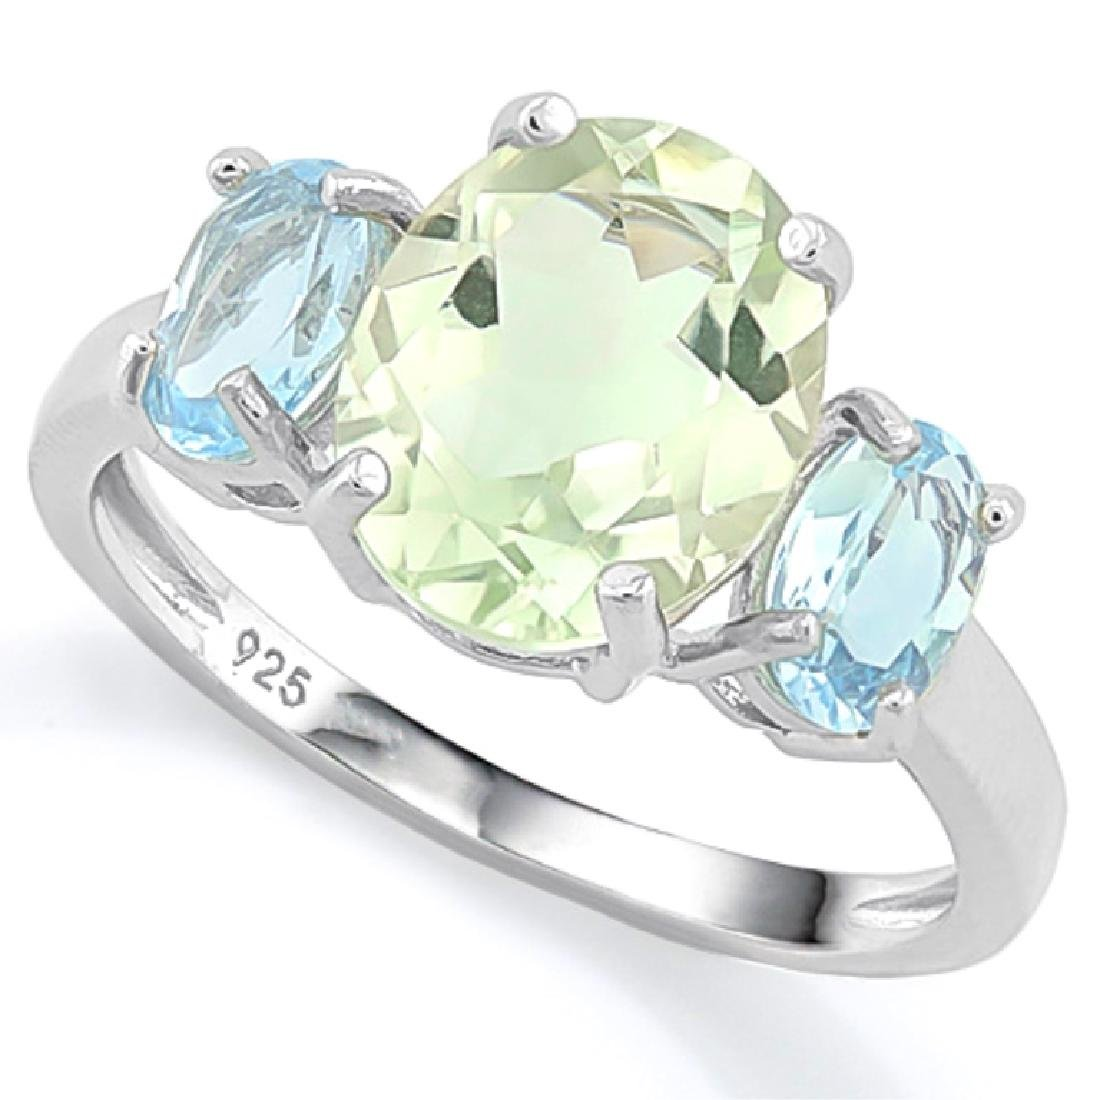 BEAUTIFUL GREEN AMETHYST/BLUE TOPAZ 4CT RING